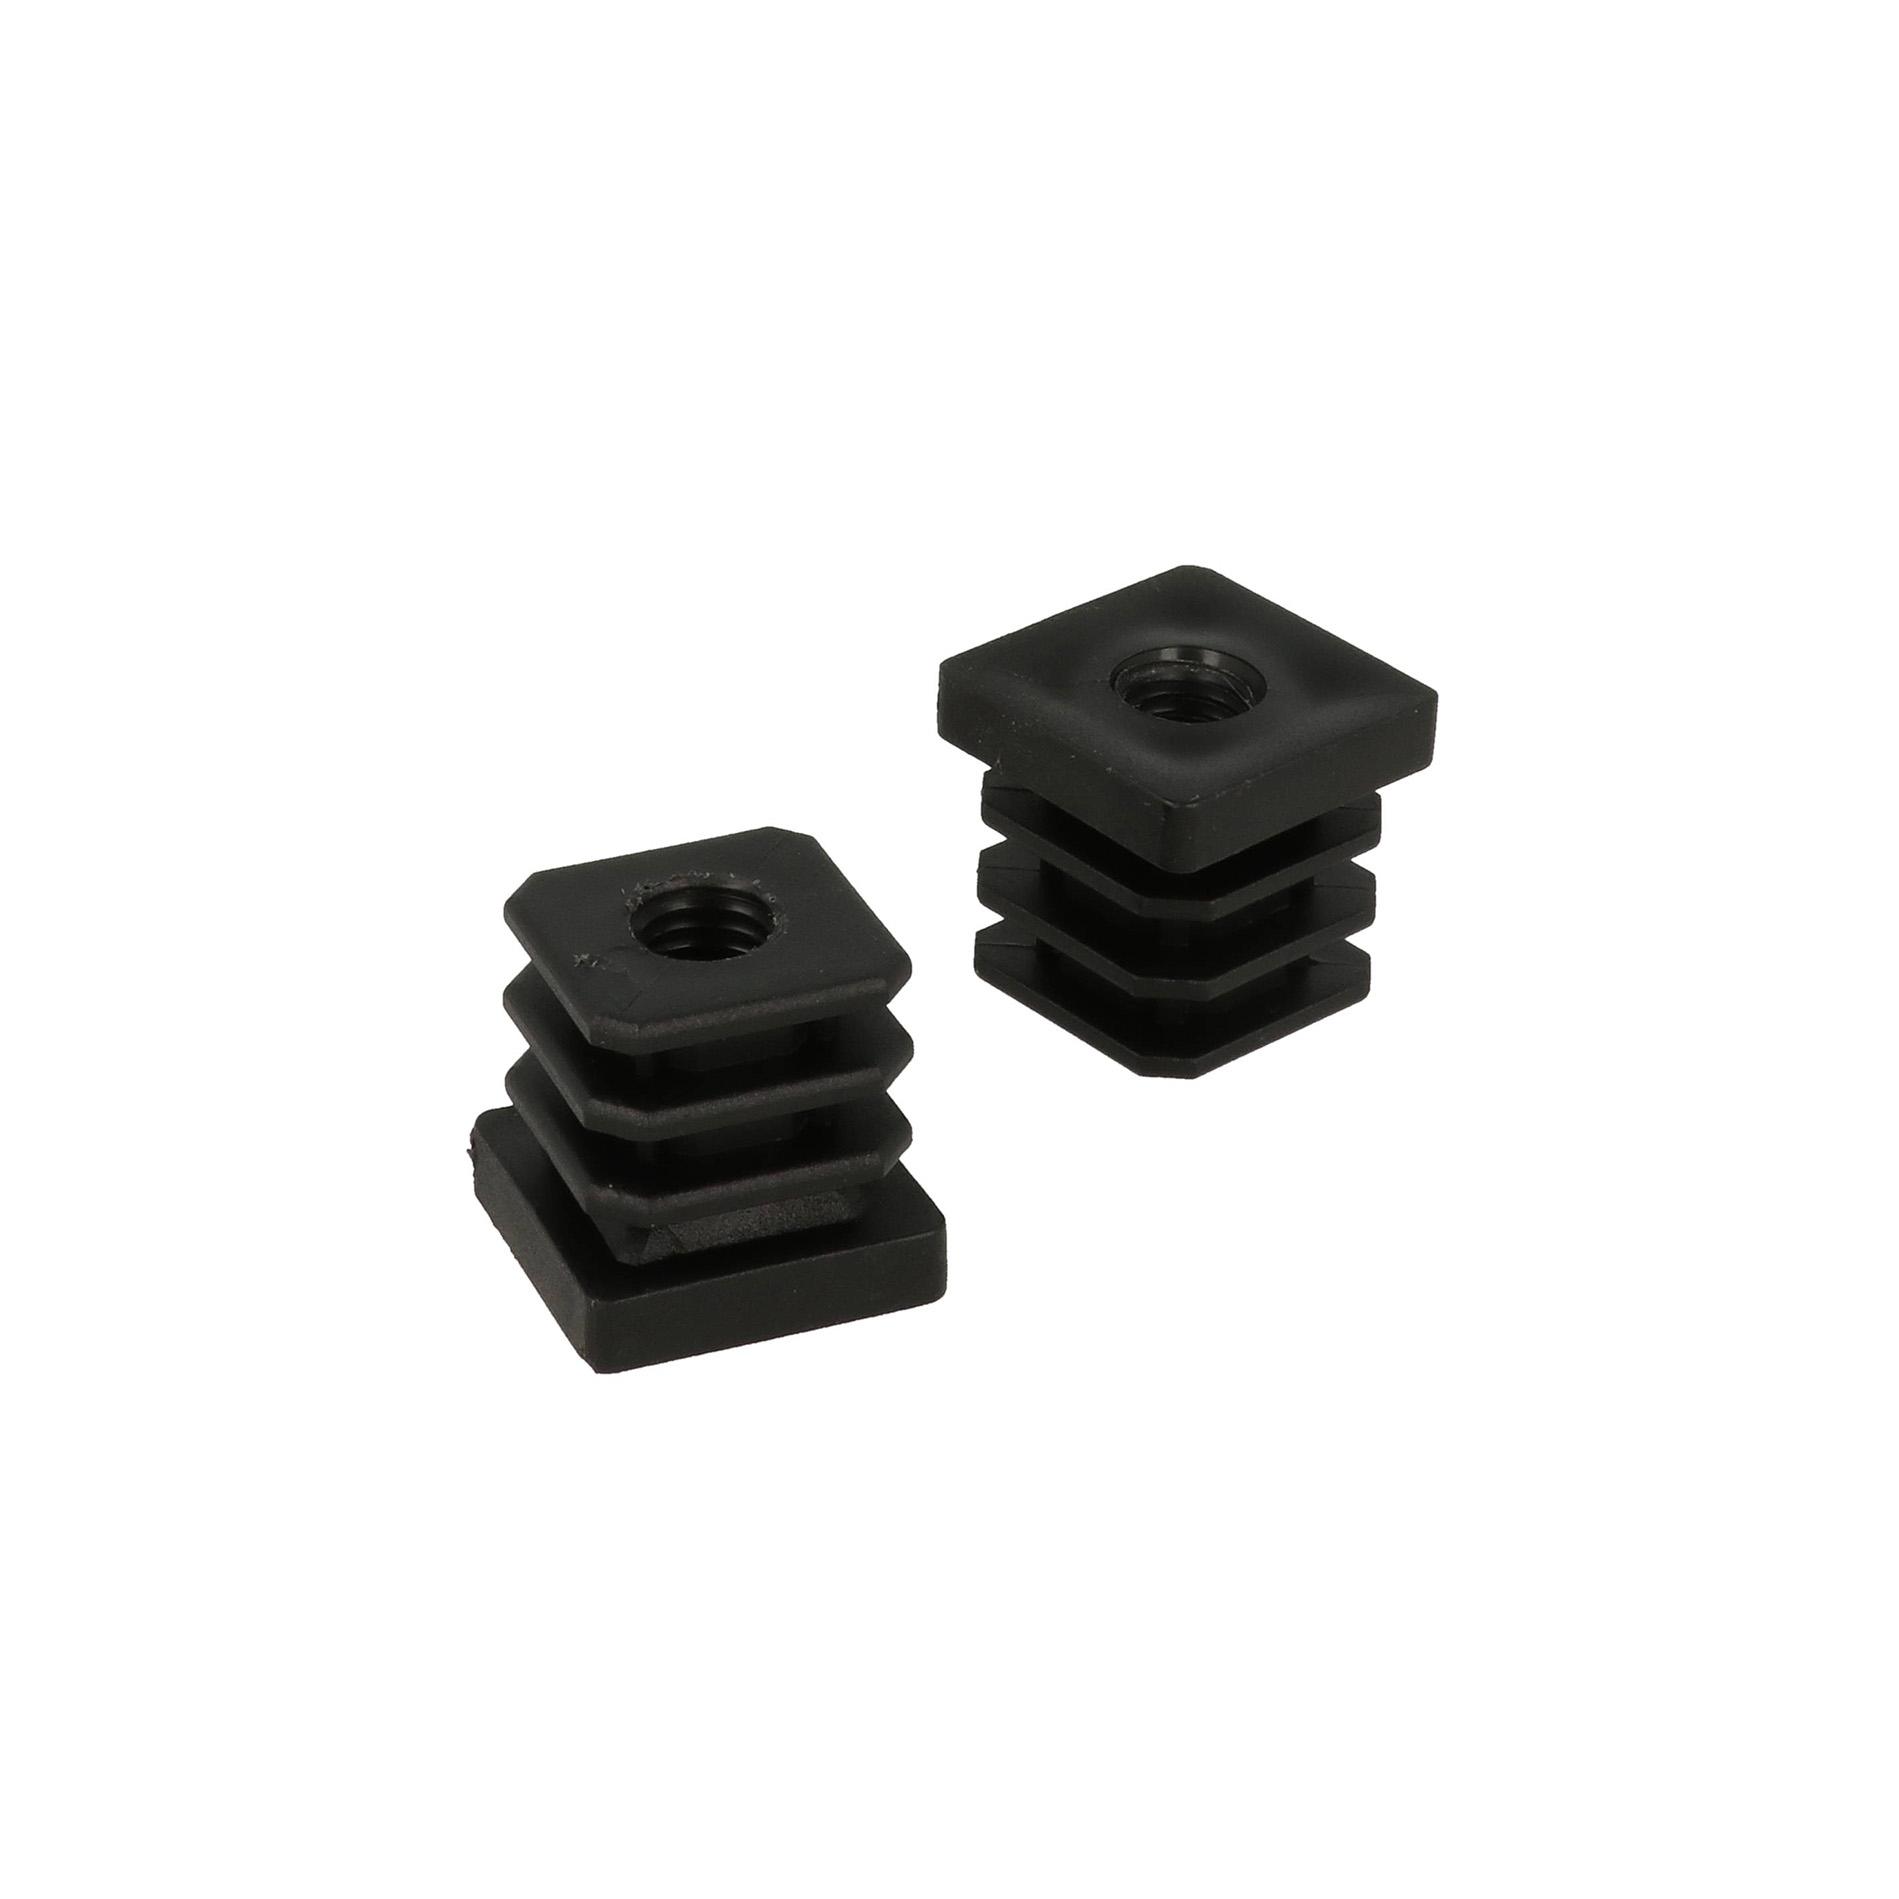 PUNTALE INT ALET+F M10 -25X25 PZ 4